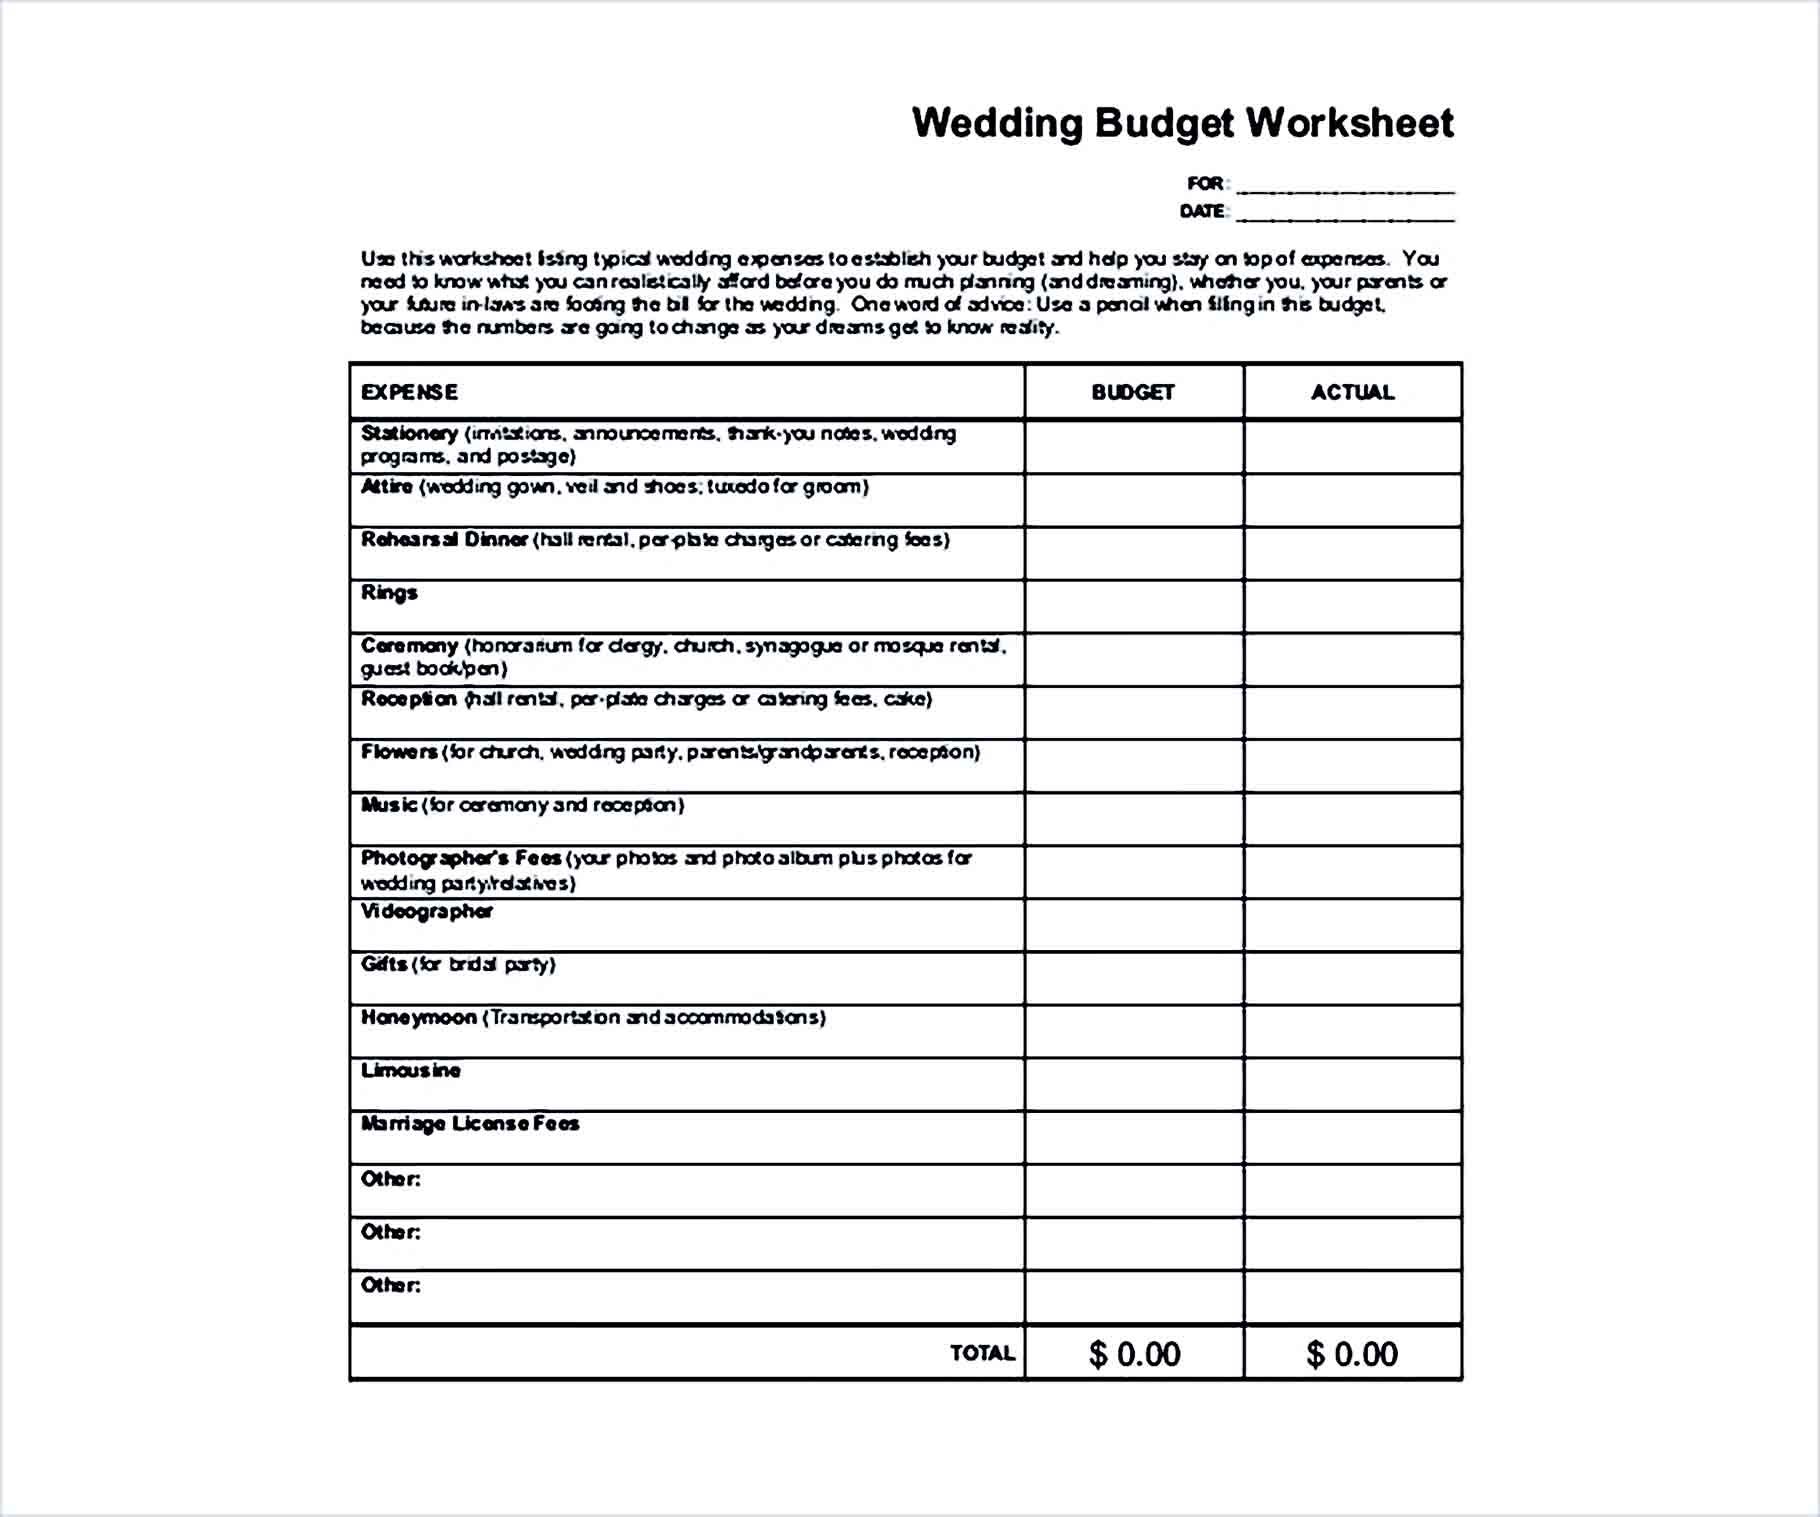 Sample Wedding Worksheet